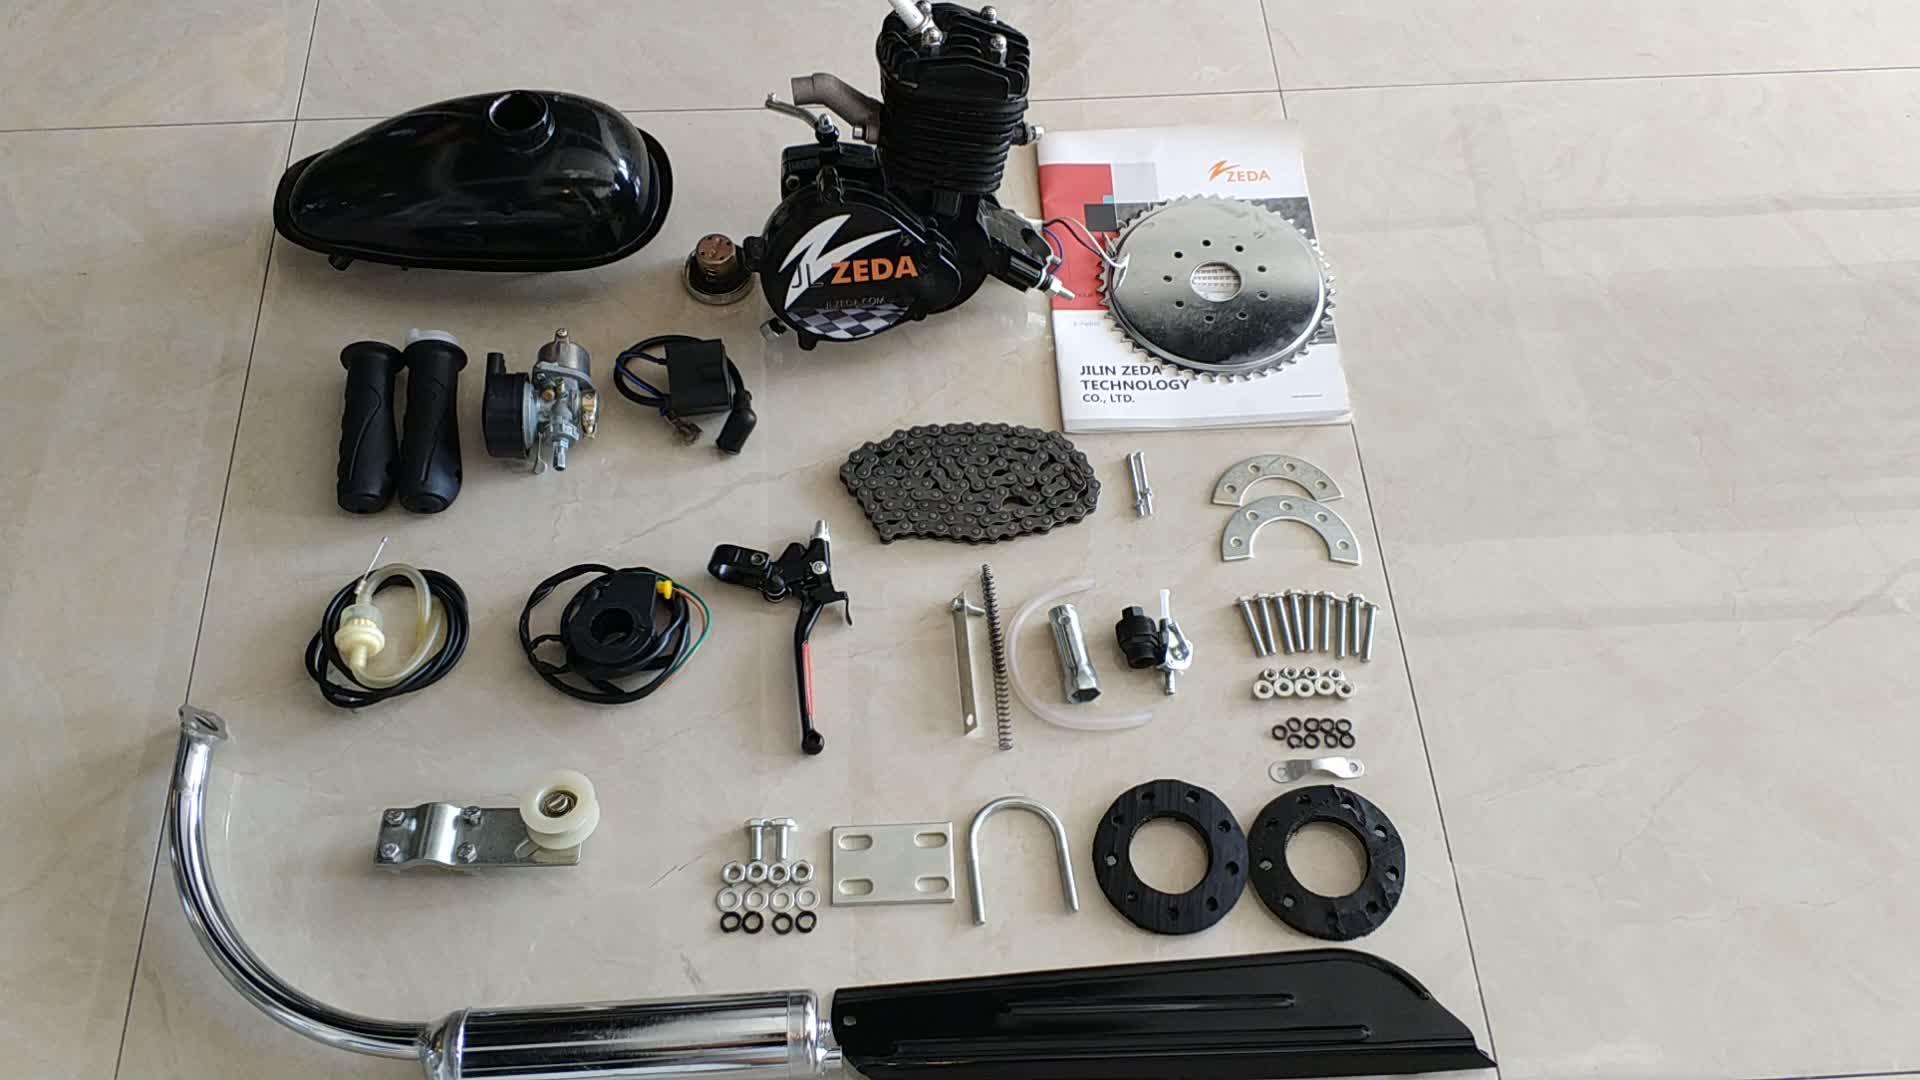 Benzina motor bike kit 80cc/kit motore gasolina para 80cc bicicleta